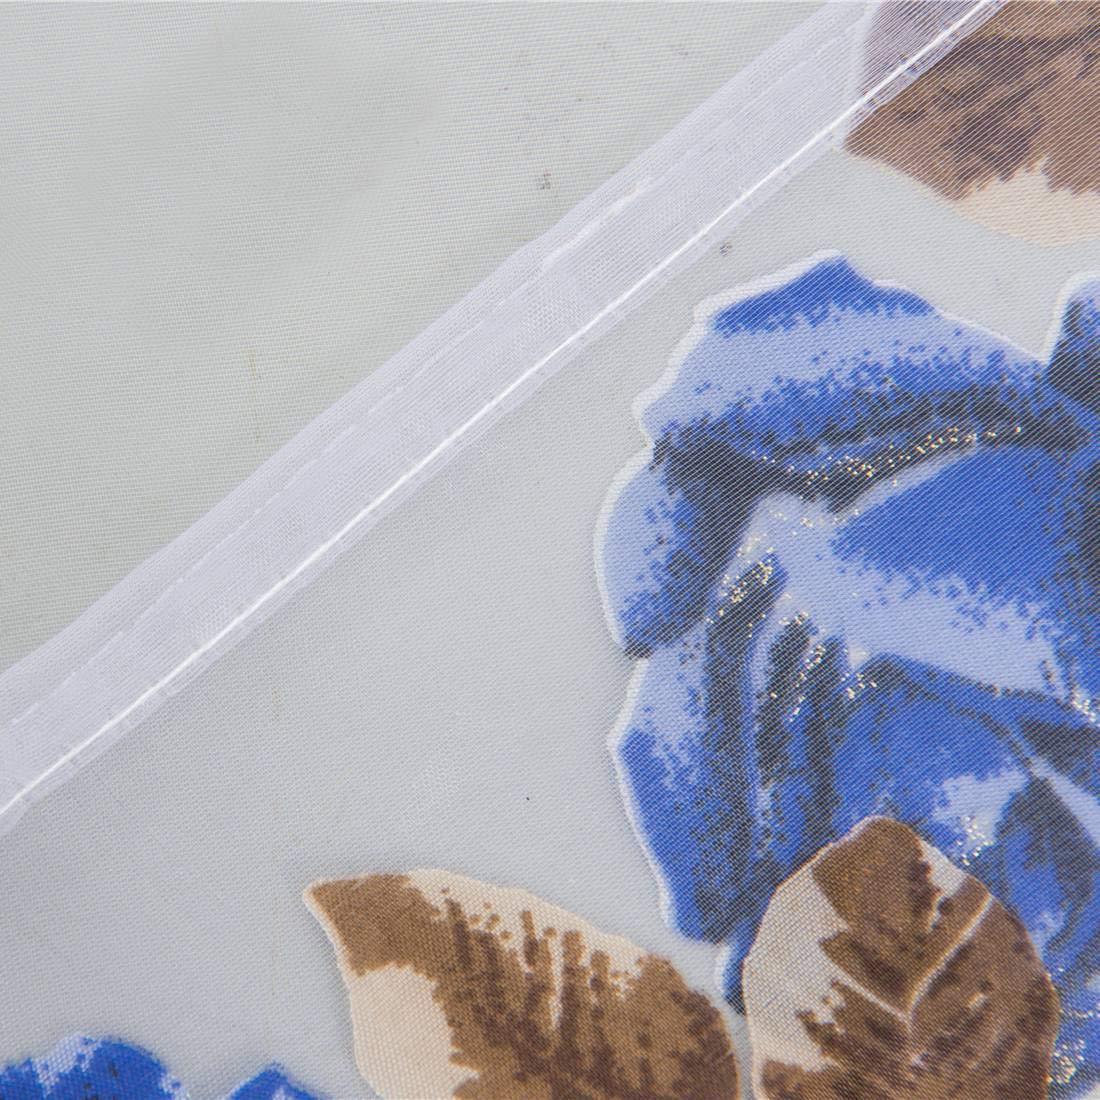 Cortinas Transl/úcidas para Boda Fiesta de Flores Elegente Rom/ánticas Xianheng Visillos Cortinas Gasas Paneles Ventana Cortinas para Sala Dormitorio Sal/ón 2 Piezas #1